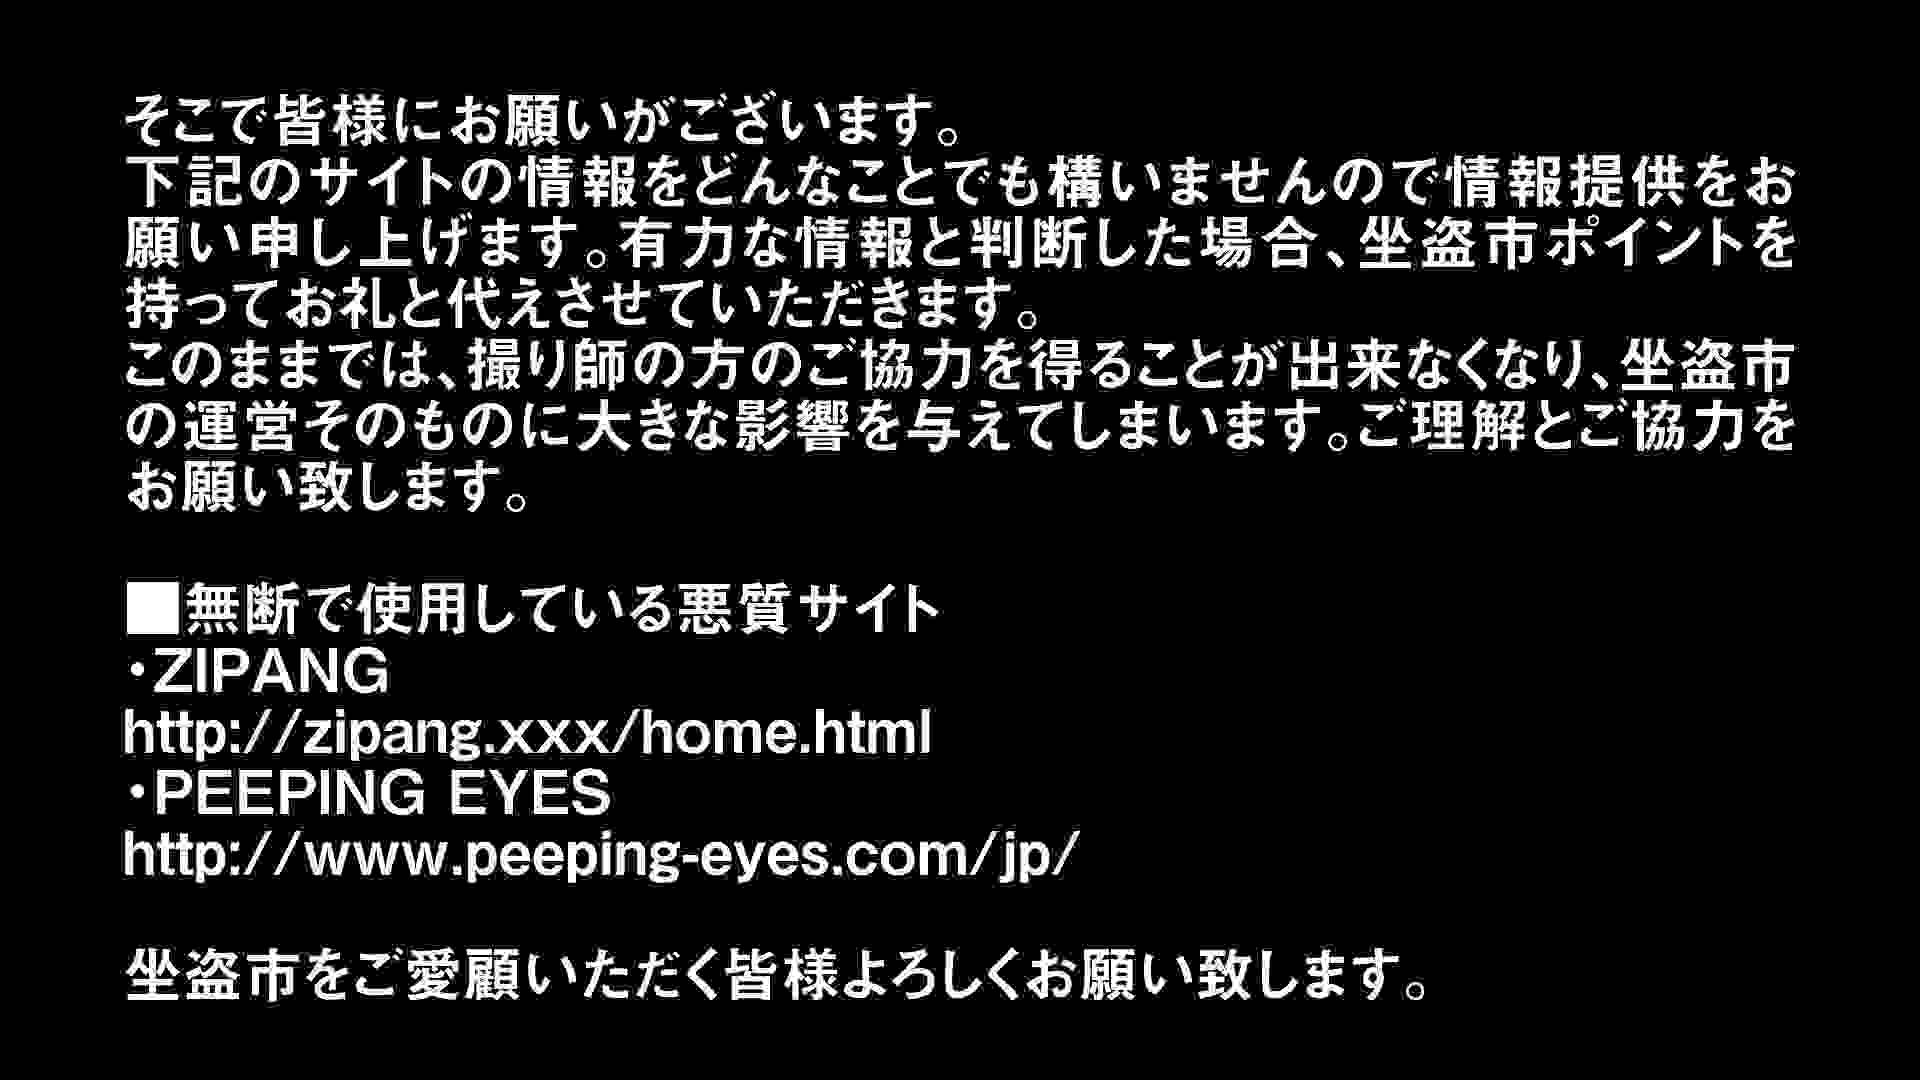 Aquaな露天風呂Vol.302 OLセックス 盗み撮りオマンコ動画キャプチャ 73画像 20